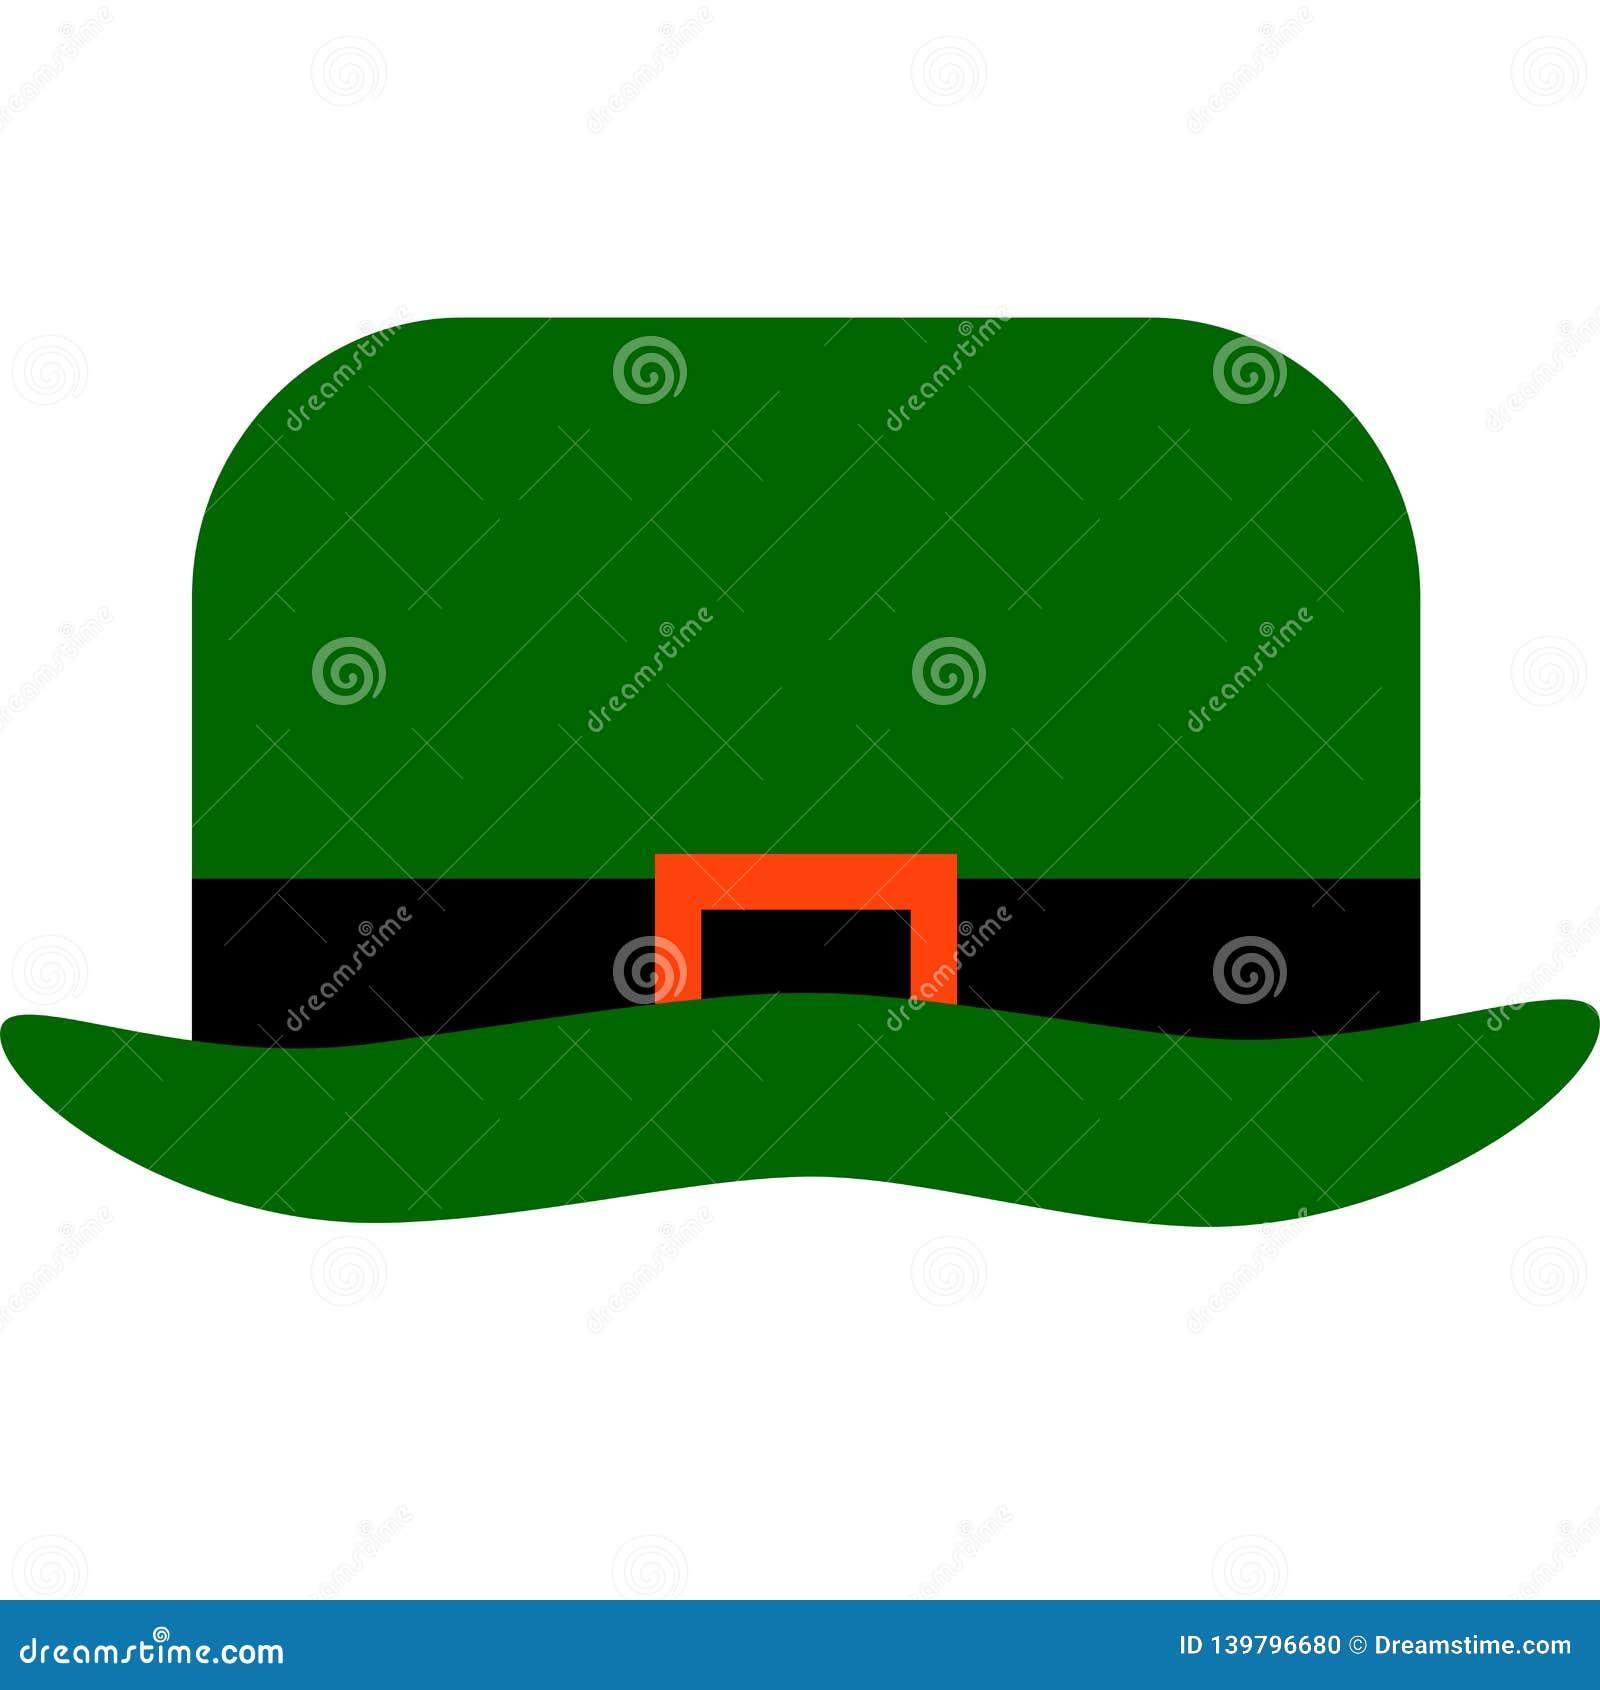 Green Leprechaun`s hat for St. Patrick`s Day decoration